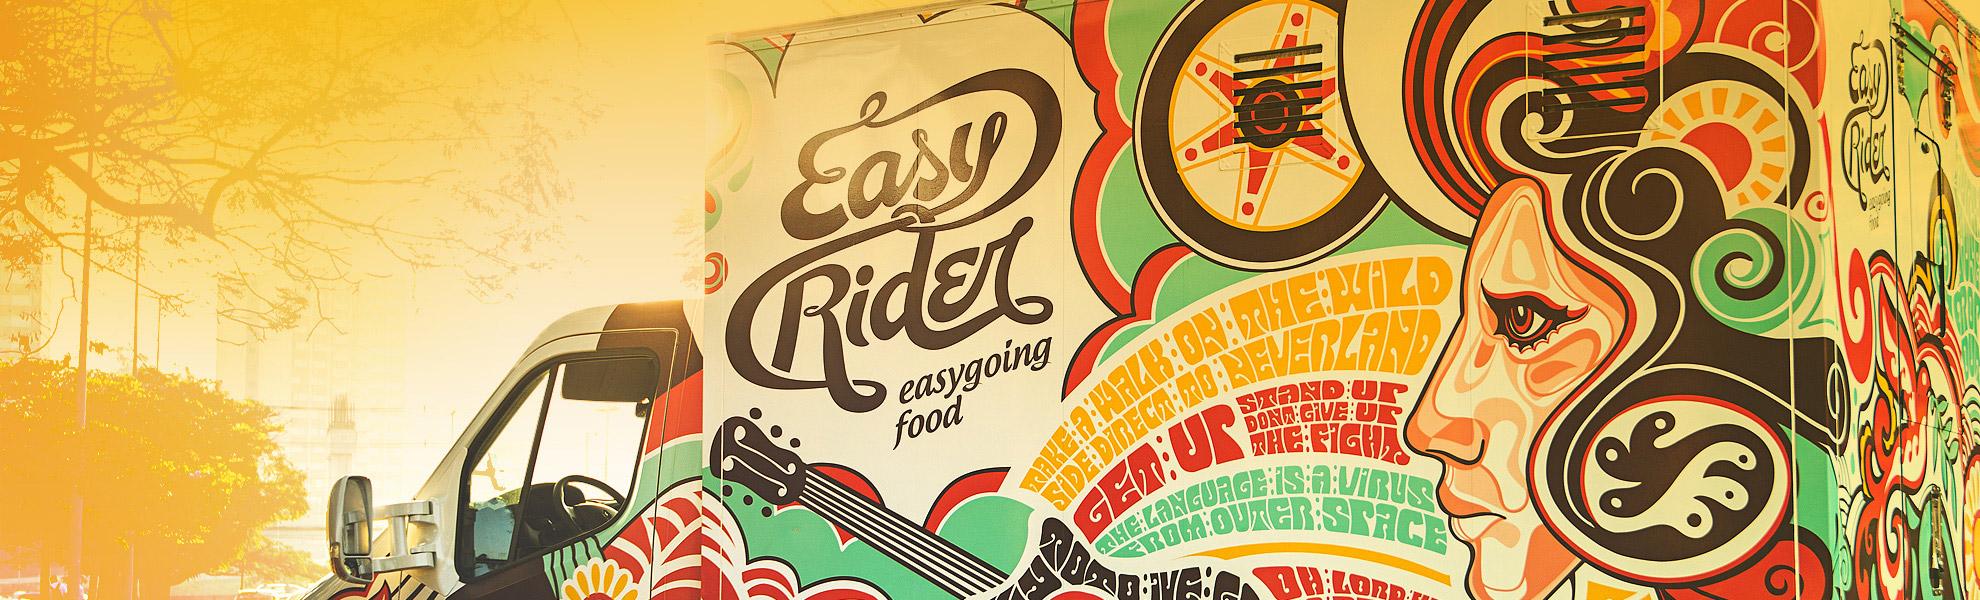 chelles-e-hayashi-design-portfolio-easy-rider-food-truck-marca-linguagem-grafico-embalagem